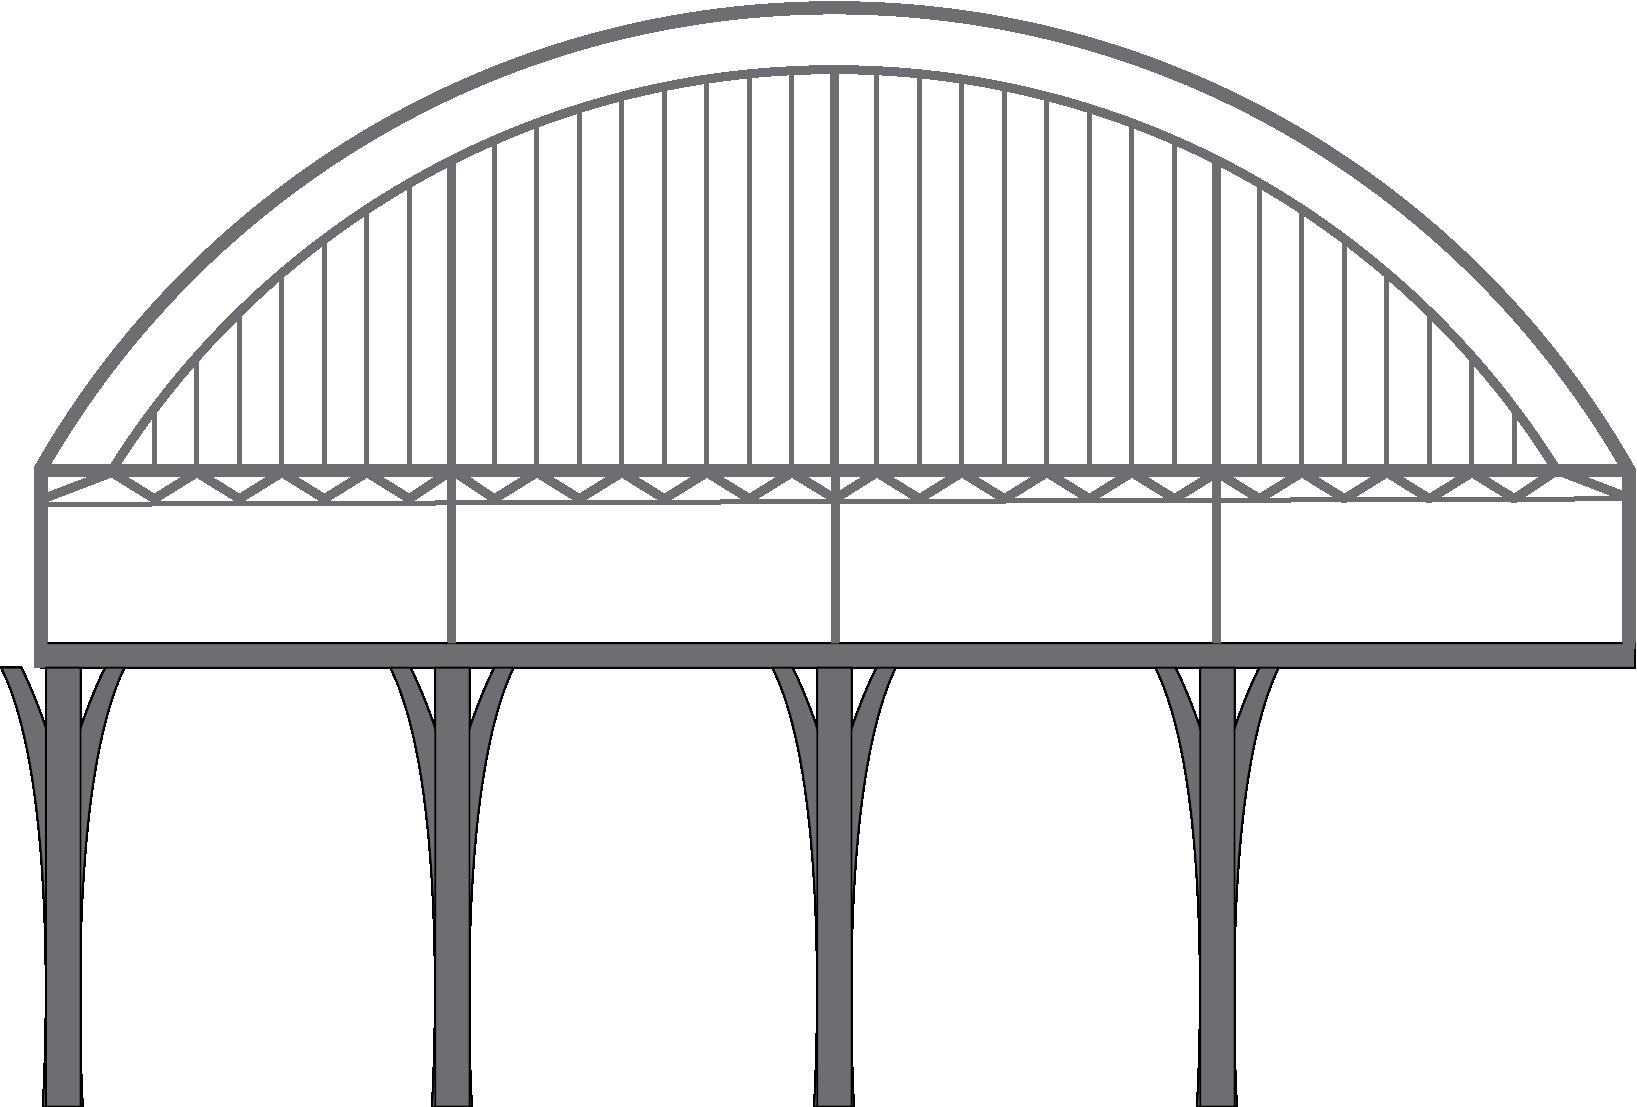 Bridge Bicycle Car Waves